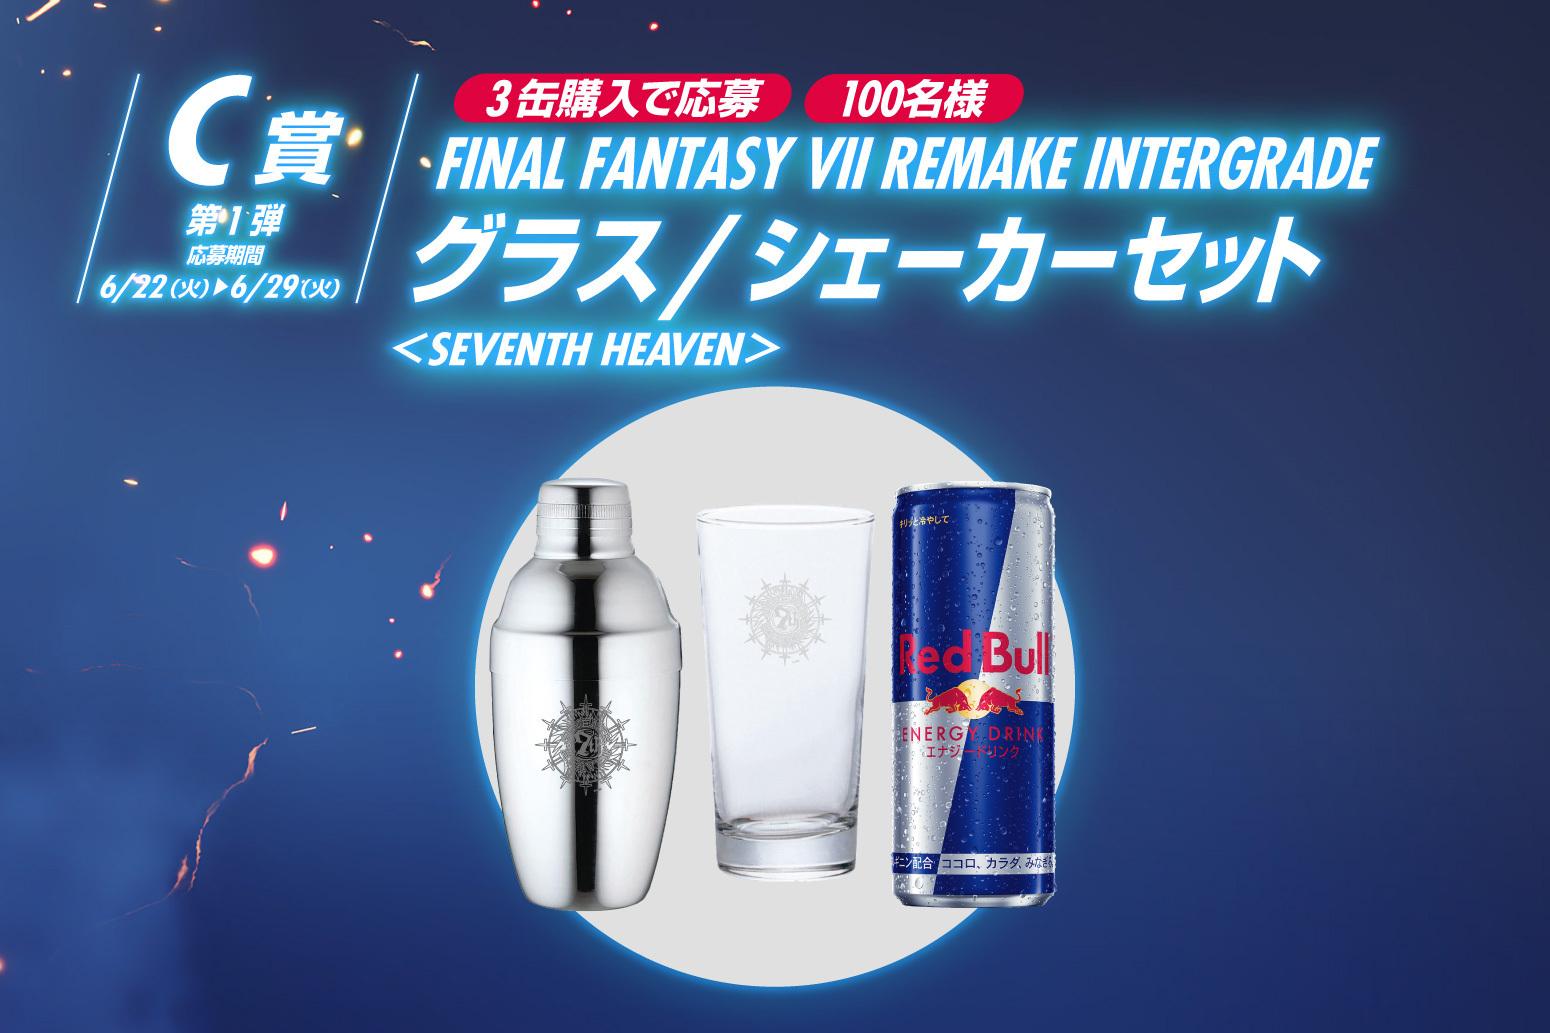 FINAL FANTASY VII REMAKE INTERGRADE グラス/シェーカーセット <SEVENTH HEAVEN>